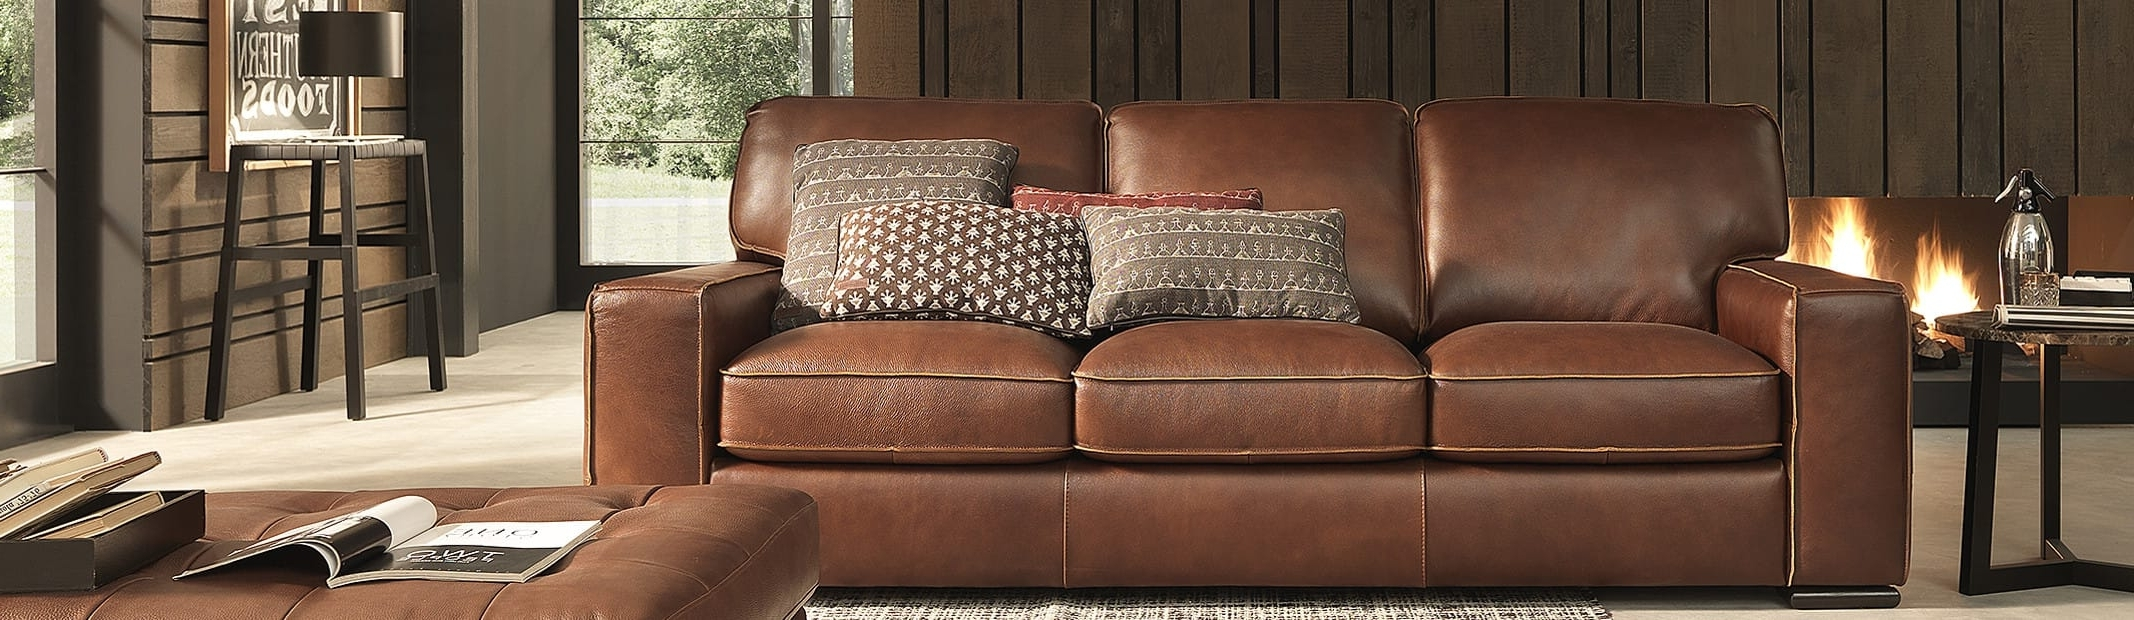 Popular Kamloops Sectional Sofas In Furniture : Kijiji Kamloops Sofa Sofa Sale Debenhams Tufted (View 15 of 15)